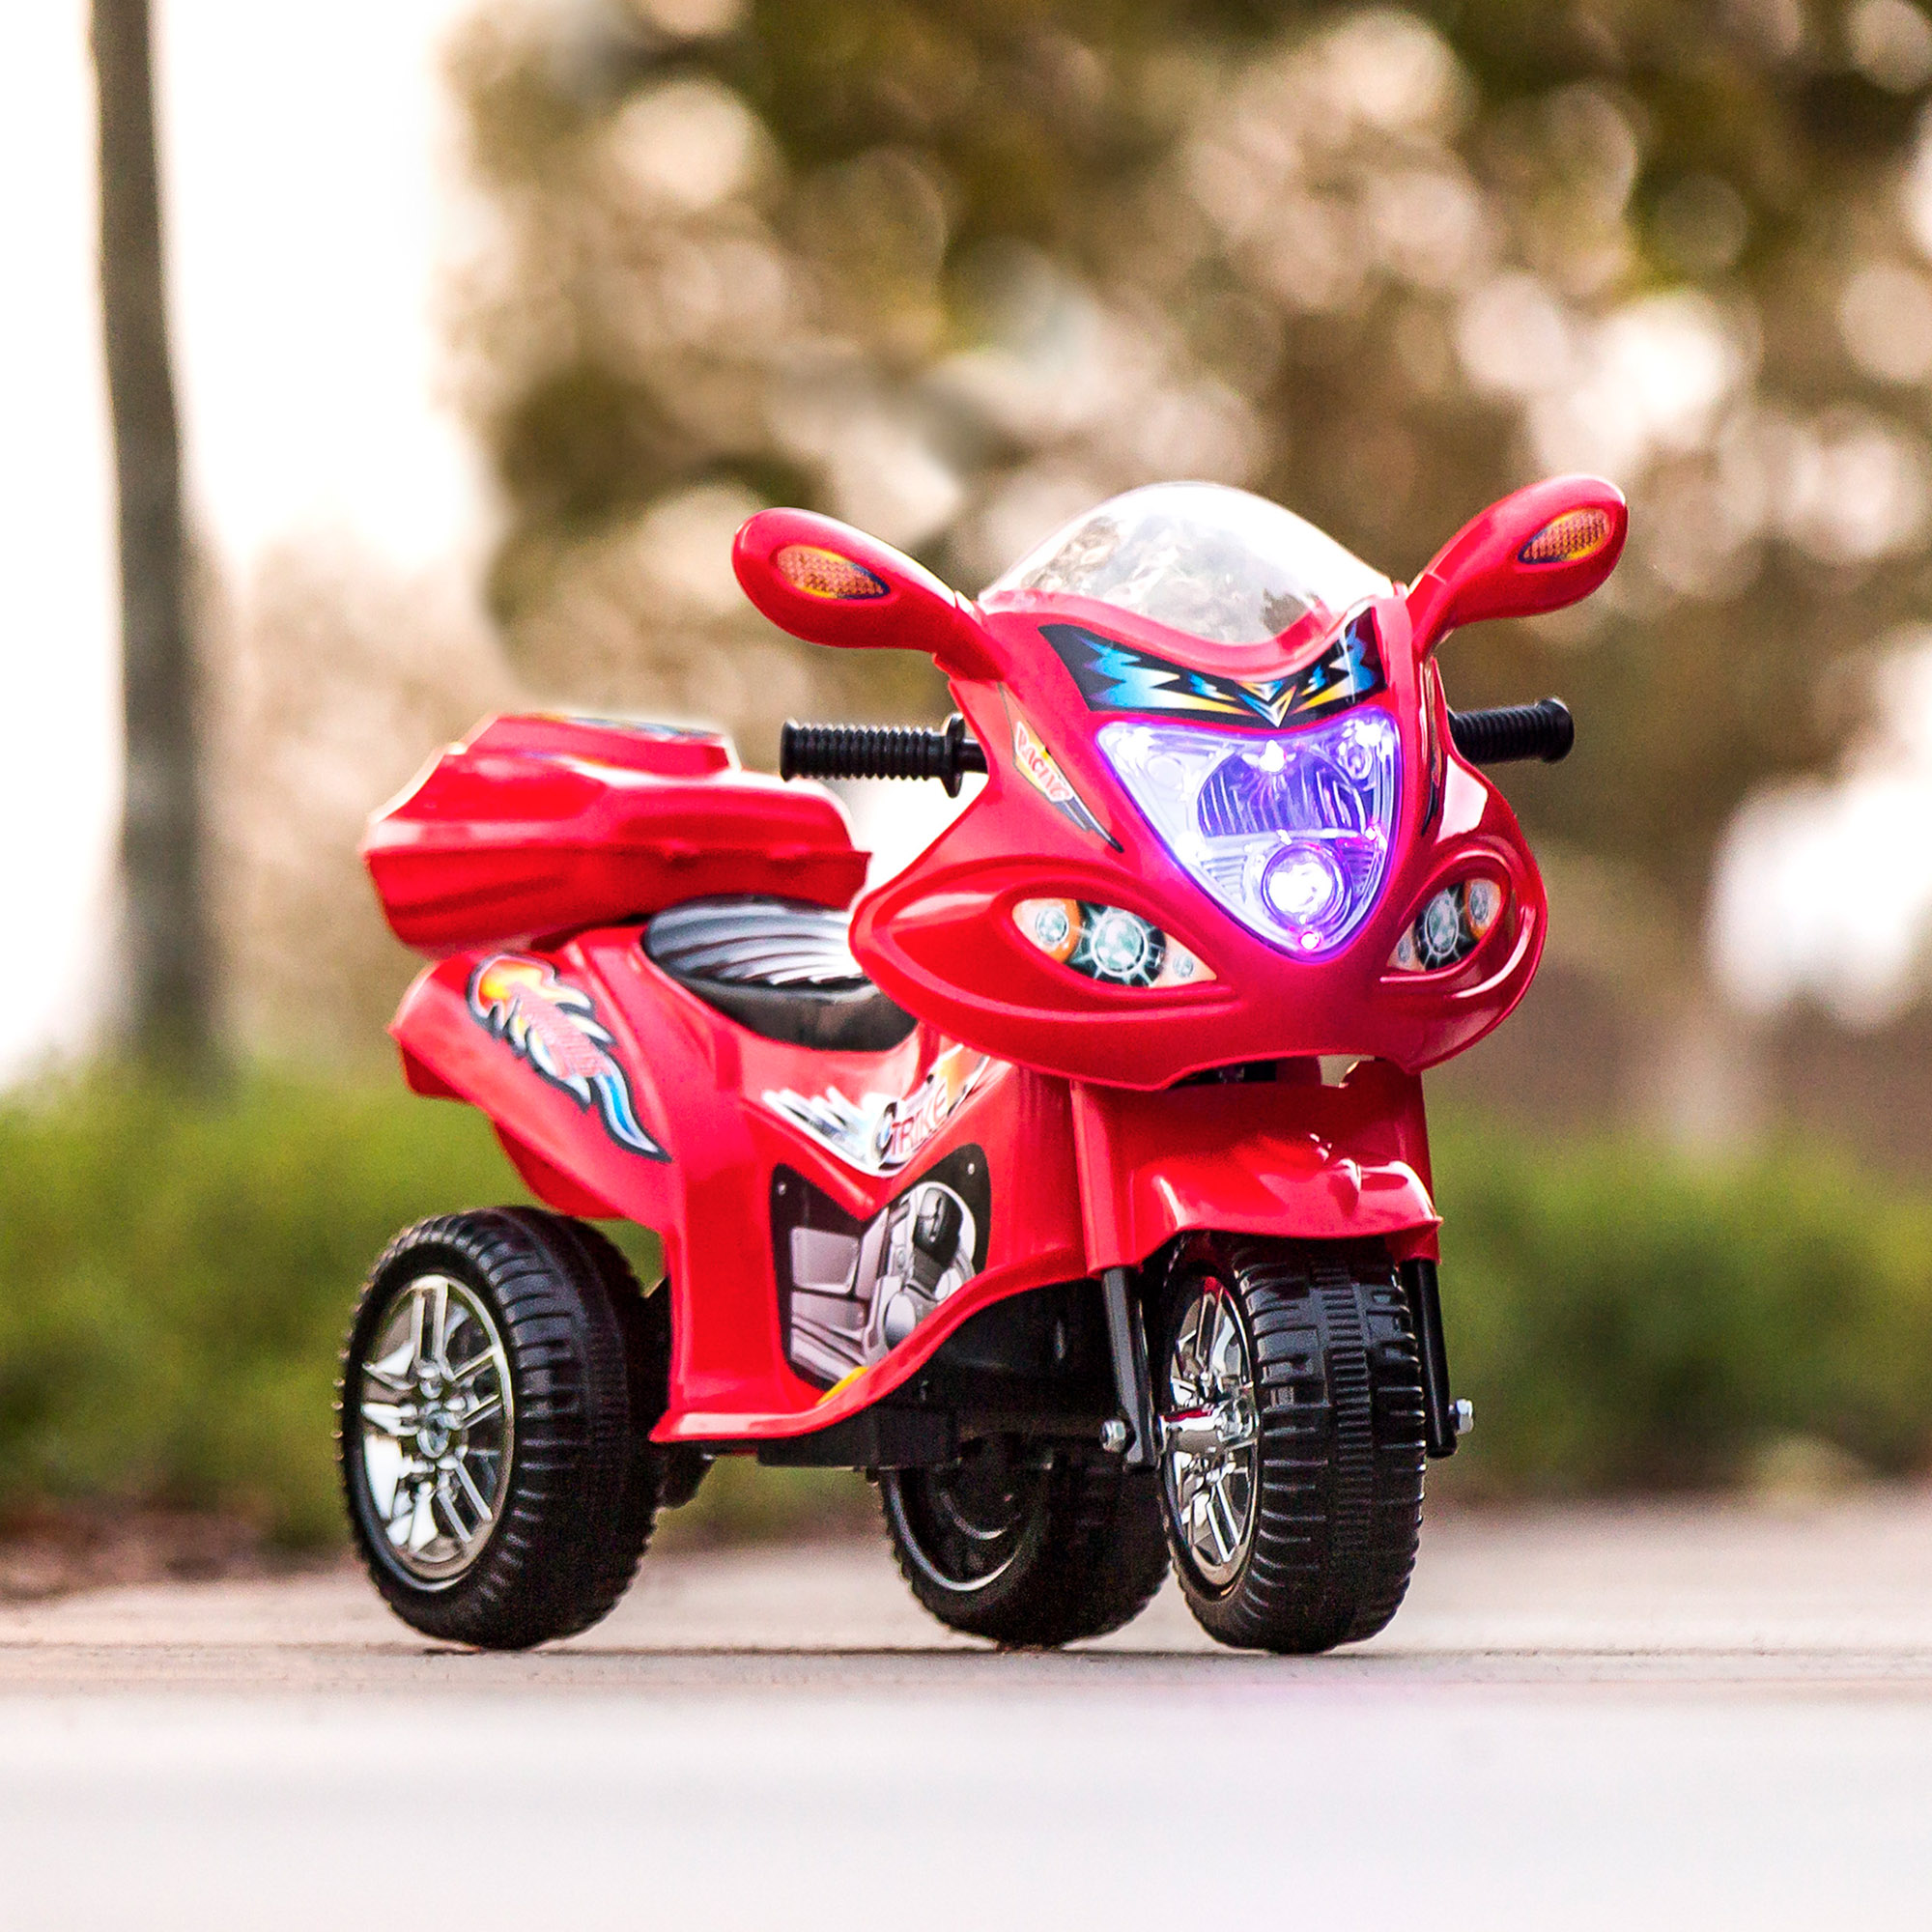 BCP-6V-Kids-3-Wheel-Motorcycle-Ride-On-Toy-w-LED-Lights-Music-Storage thumbnail 31